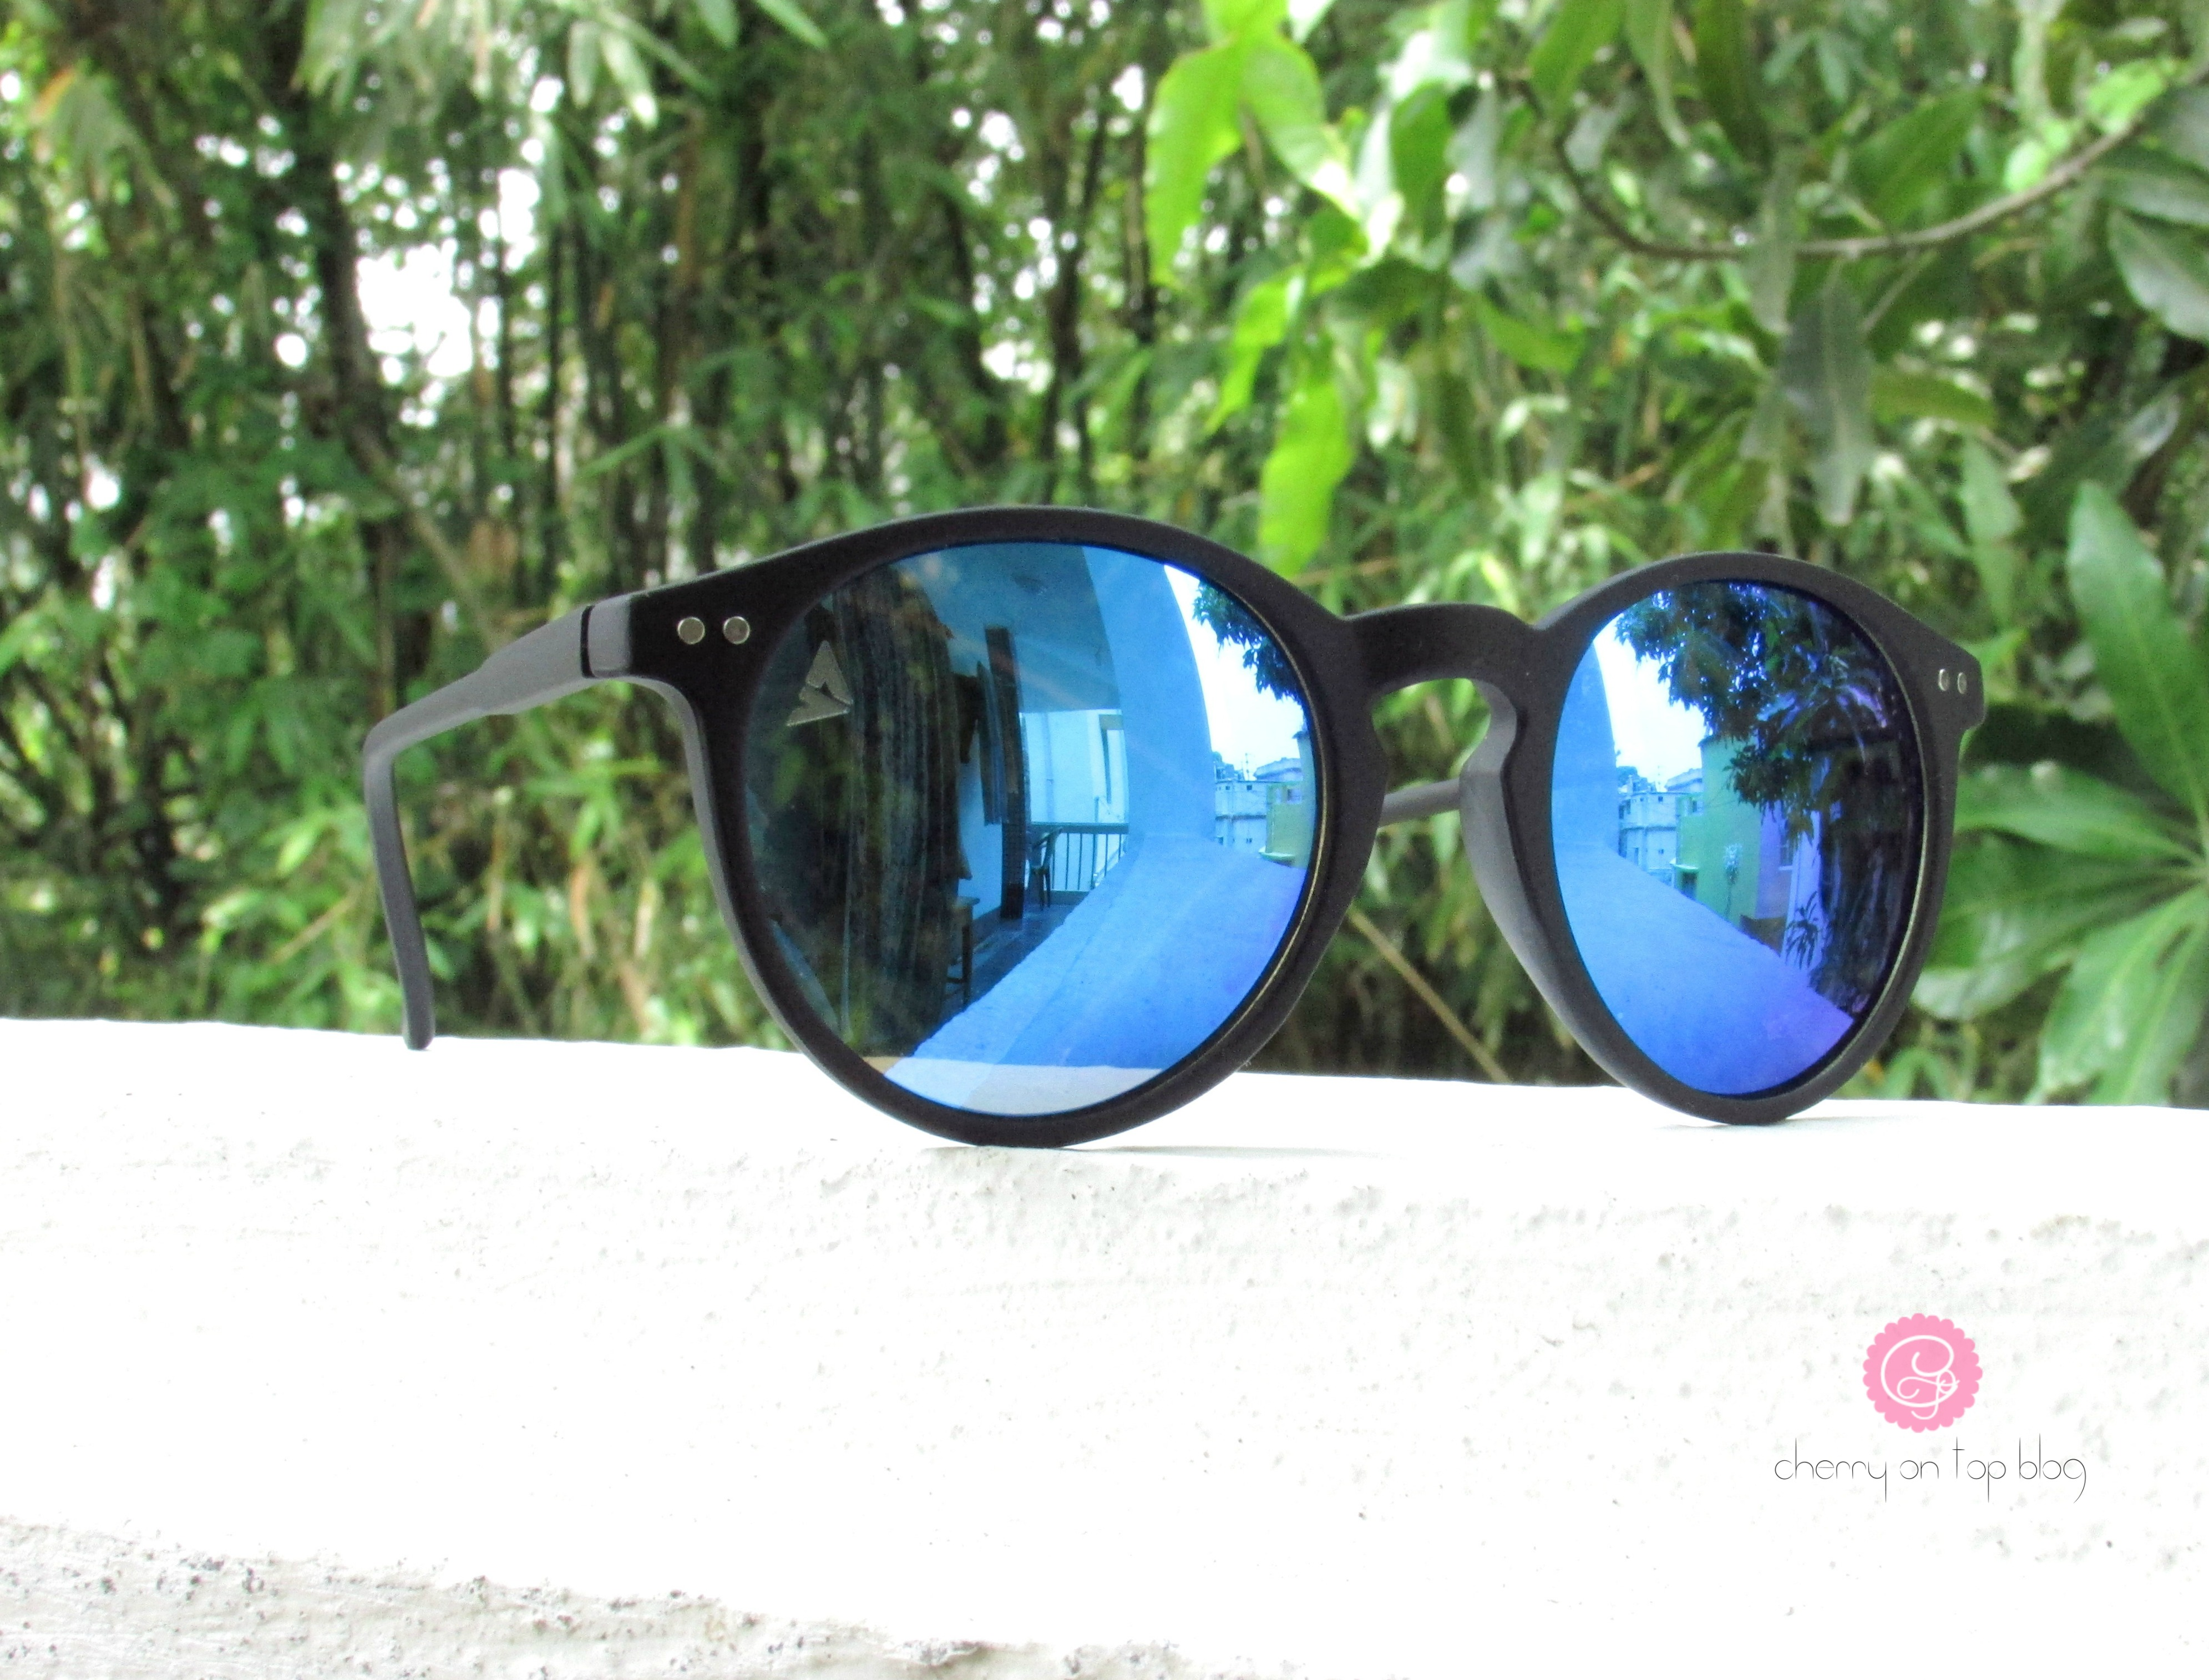 Shades of Summer|Vincent Chase Reflectors| cherryontopblog.com